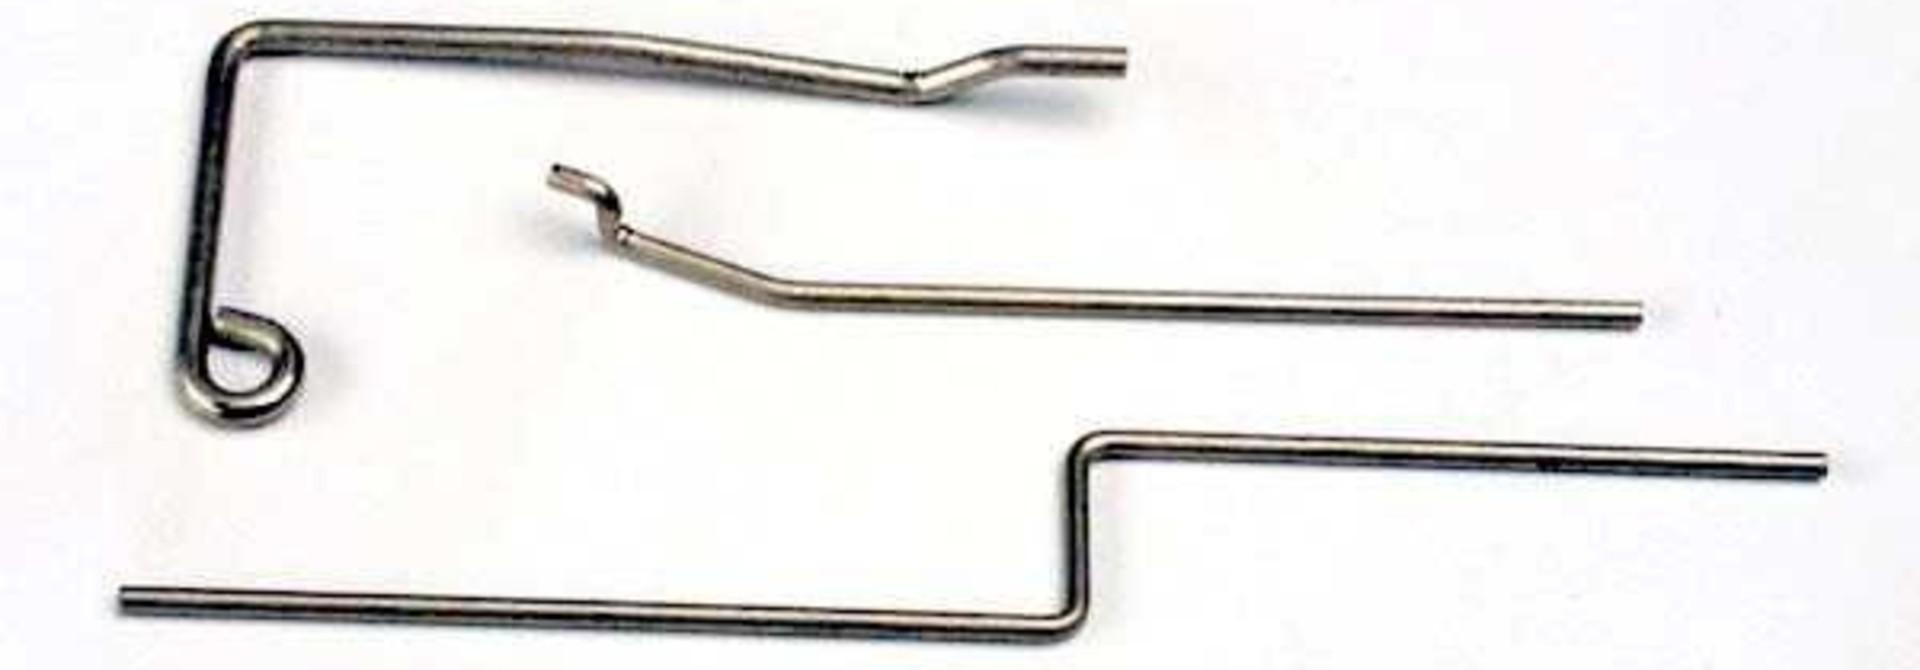 Brake lever, TRX4483